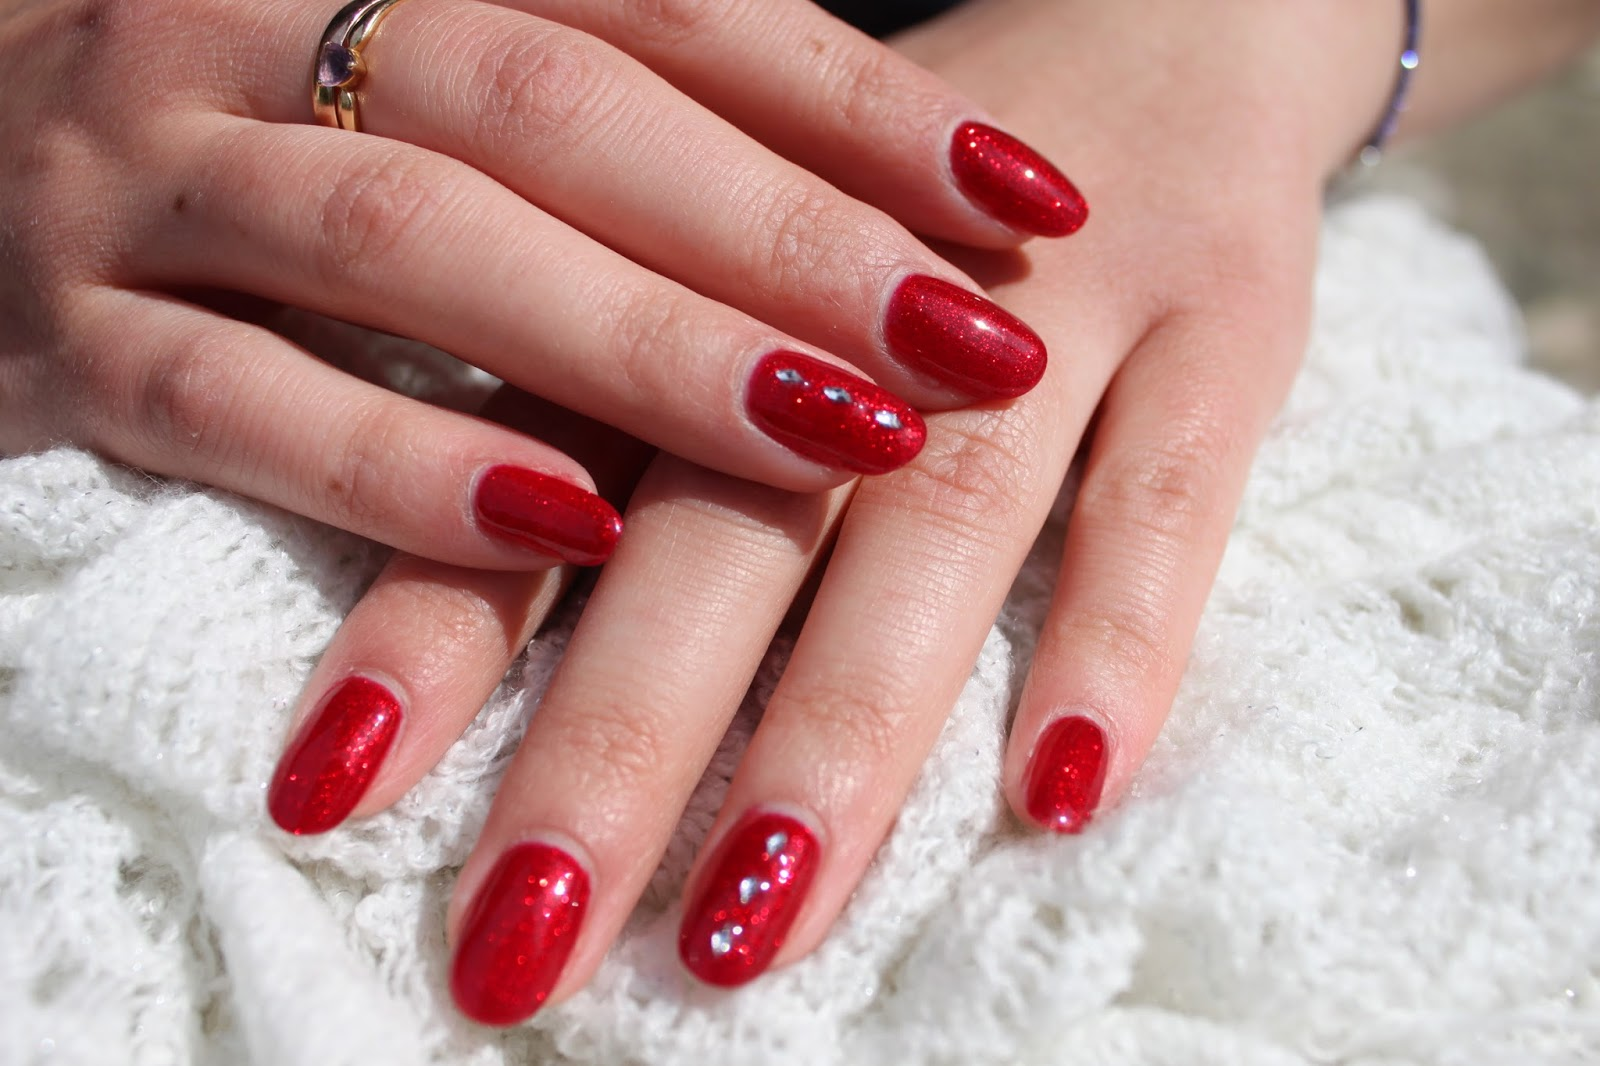 ongles vernis semi permanent rouge. Black Bedroom Furniture Sets. Home Design Ideas